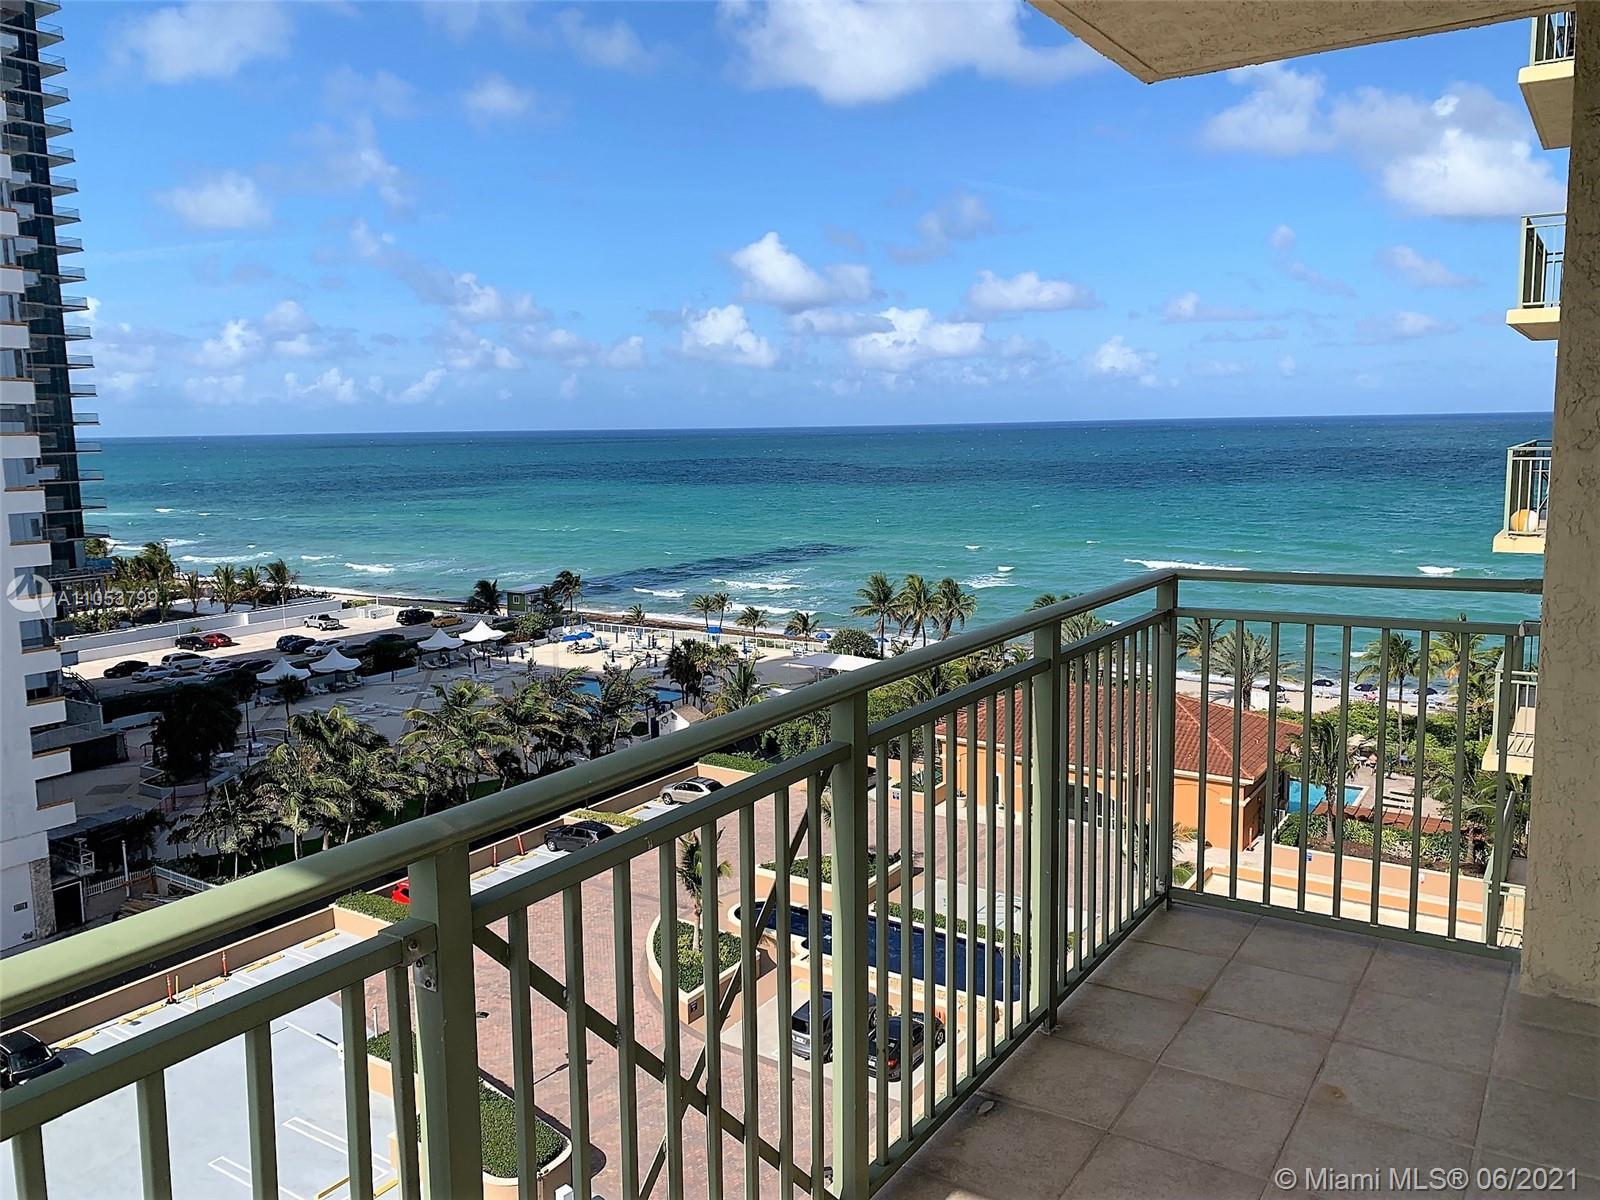 2080 Hallandale #902 - 2080 S OCEAN DRIVE #902, Hallandale Beach, FL 33009